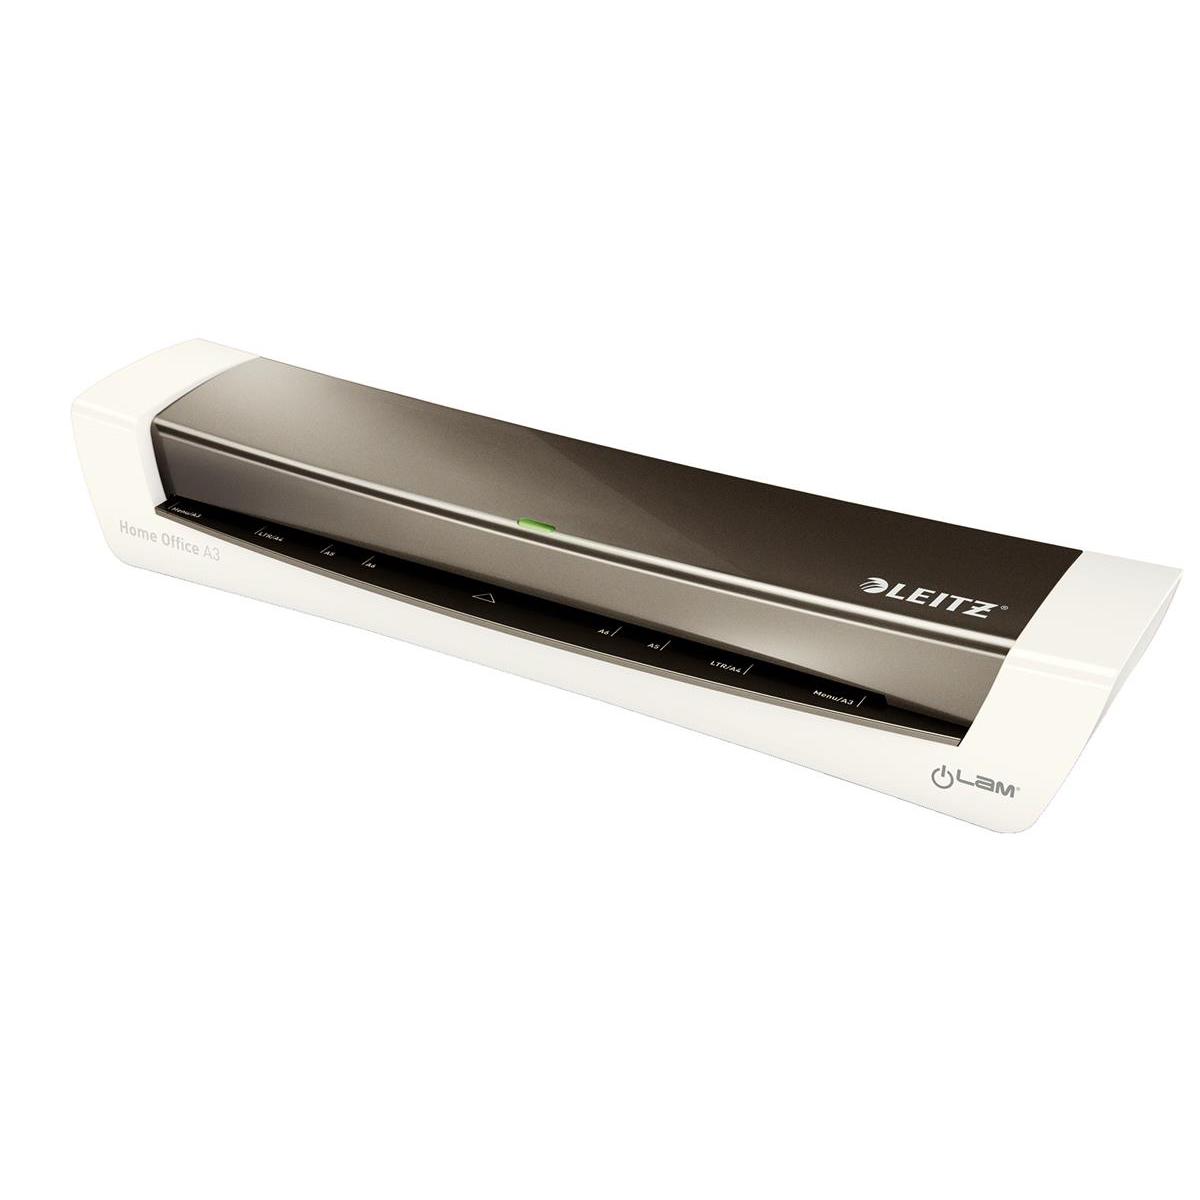 Leitz iLam HomeOffice Laminator A3 Grey Ref 74401089